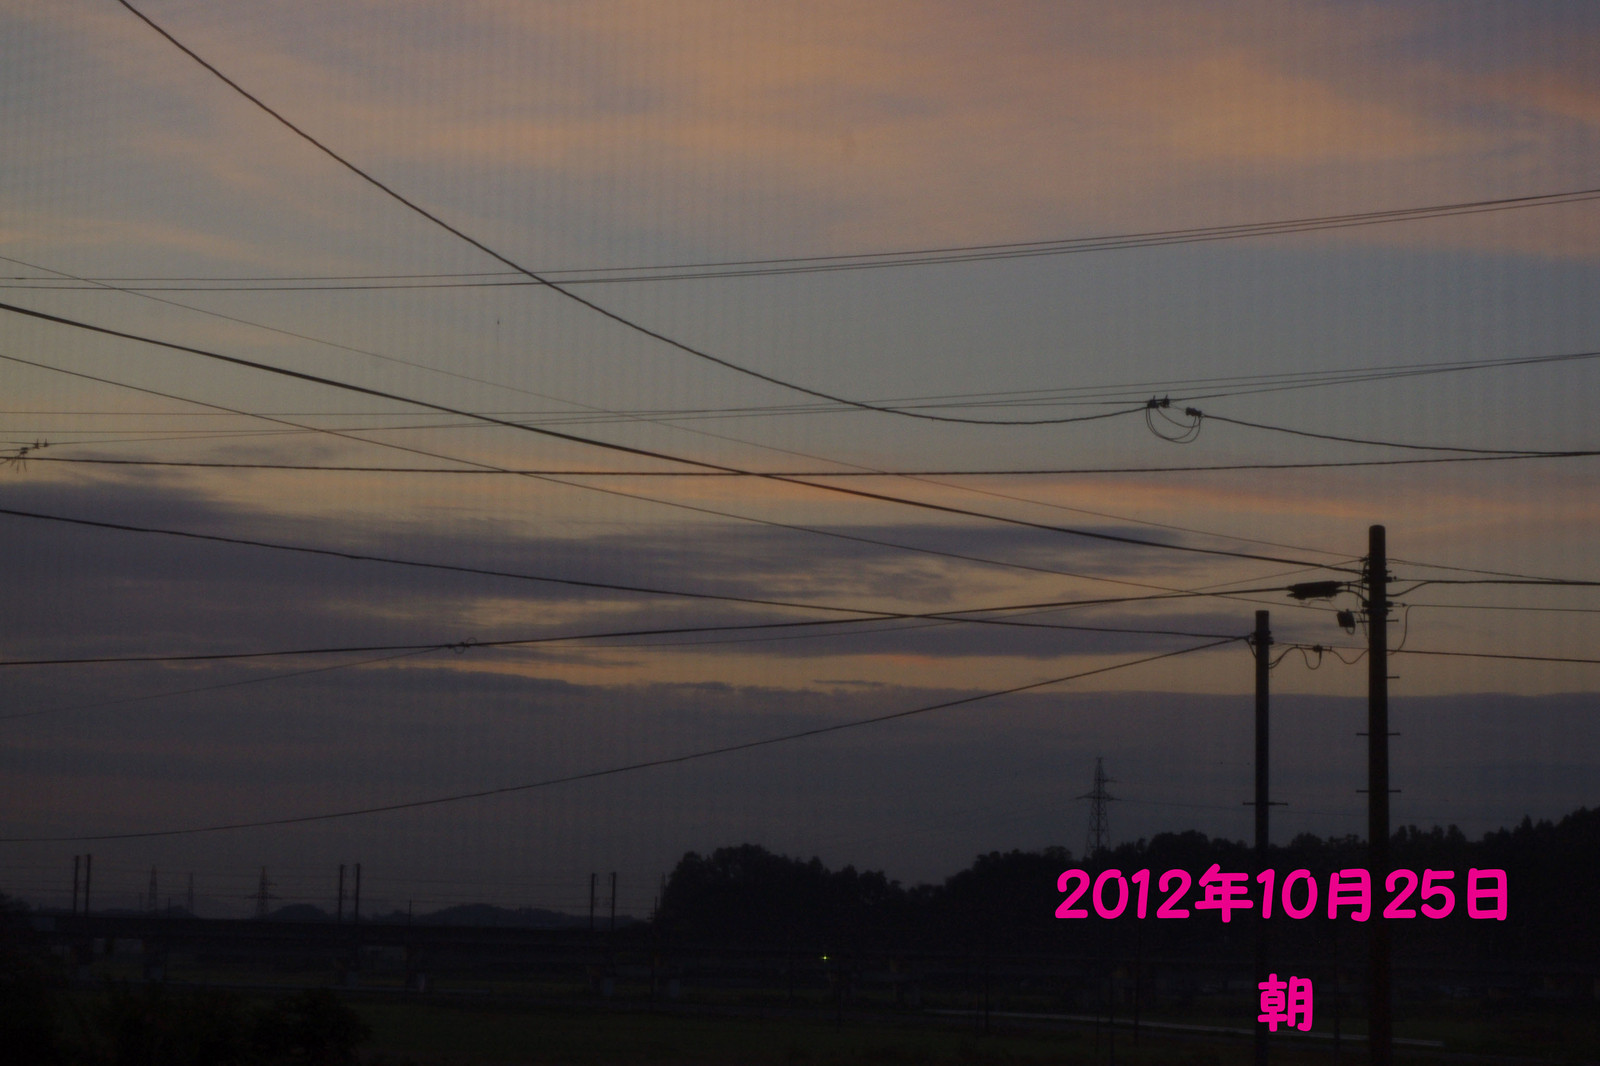 2012_10_25_1255_edited1